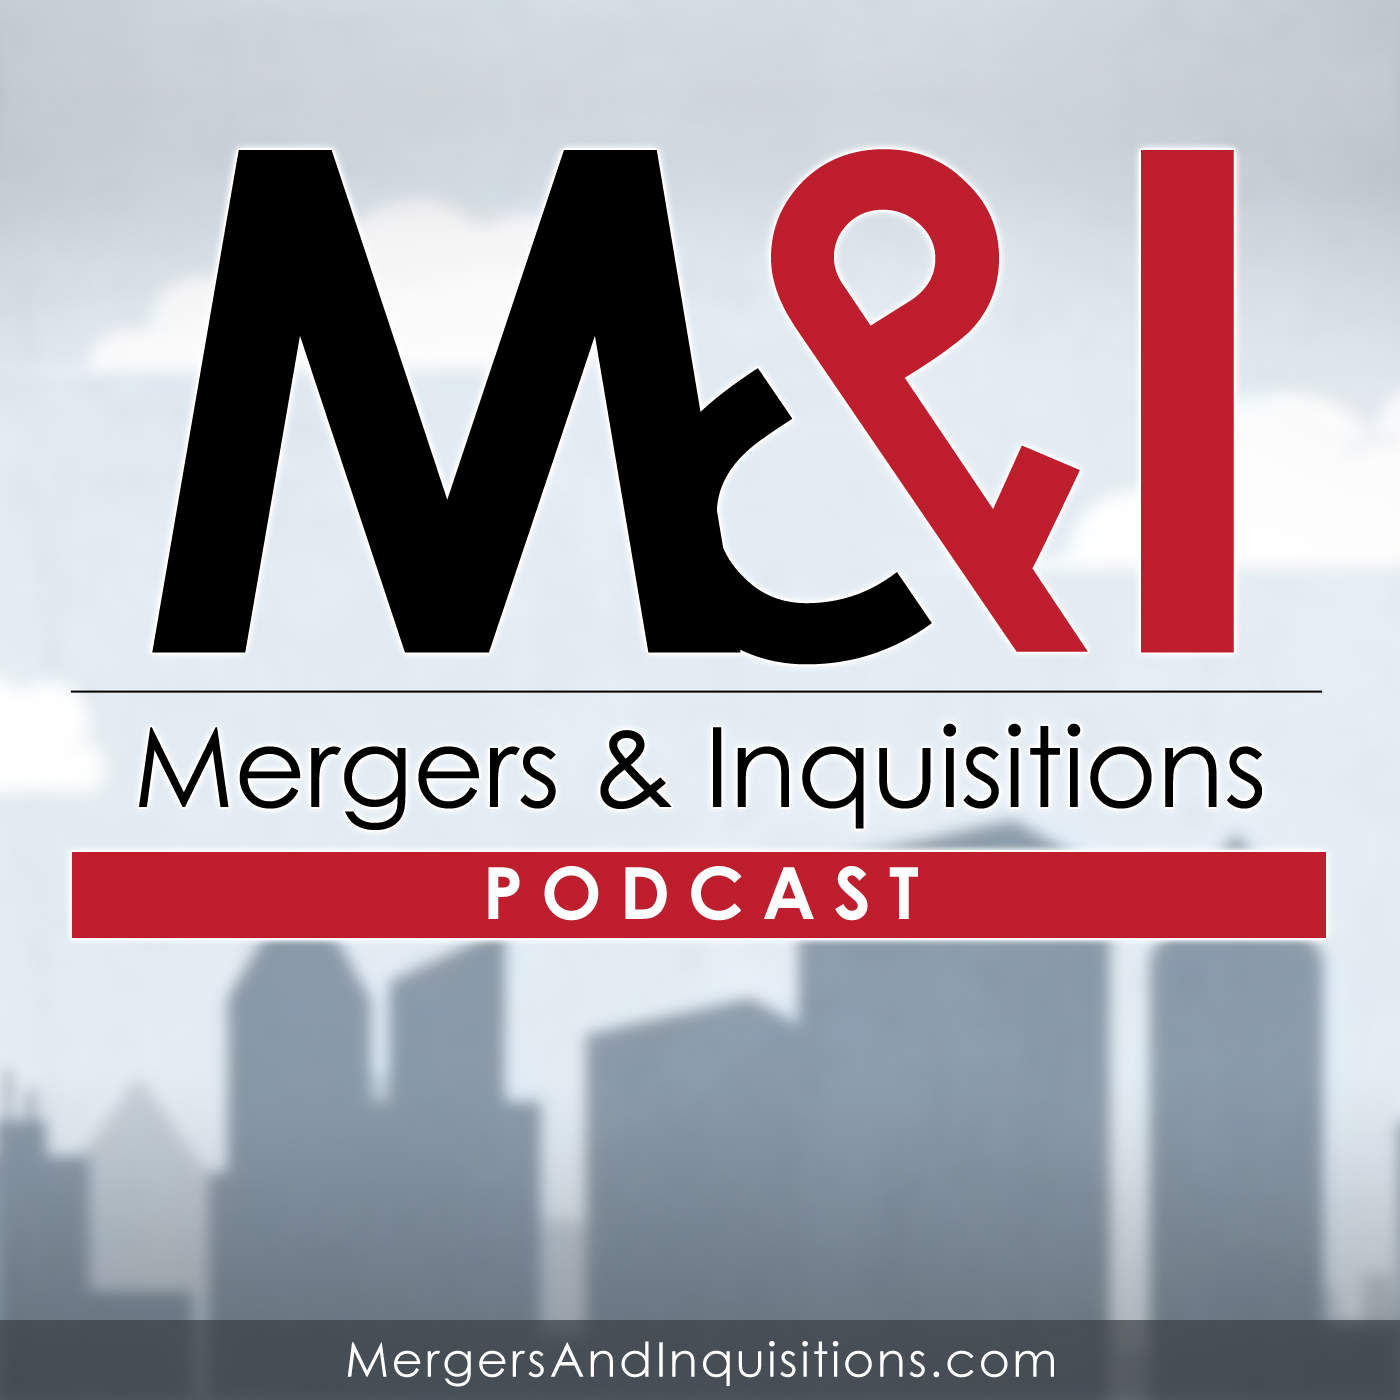 M&I-Mergers&Inquisitions_albumart_1-blurredbg